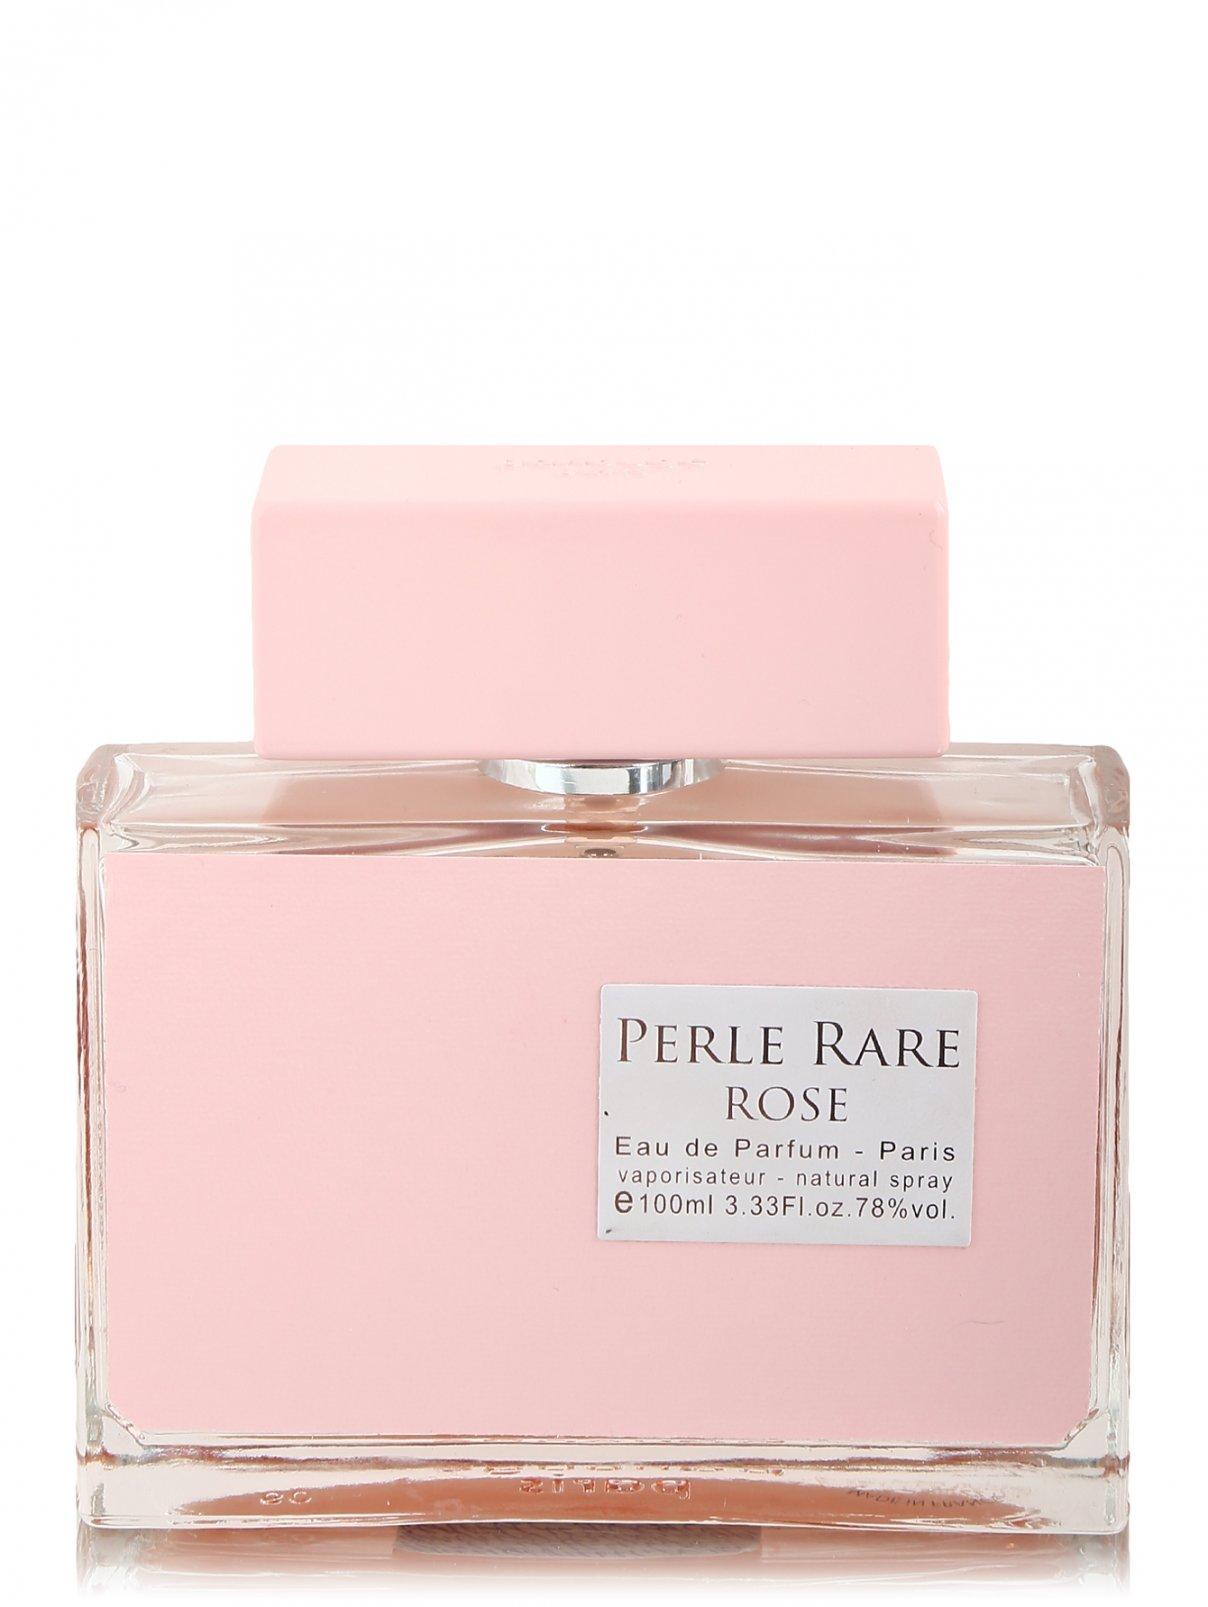 Парфюмерная вода 100 мл Perle Rare Rose Panouge  –  Общий вид